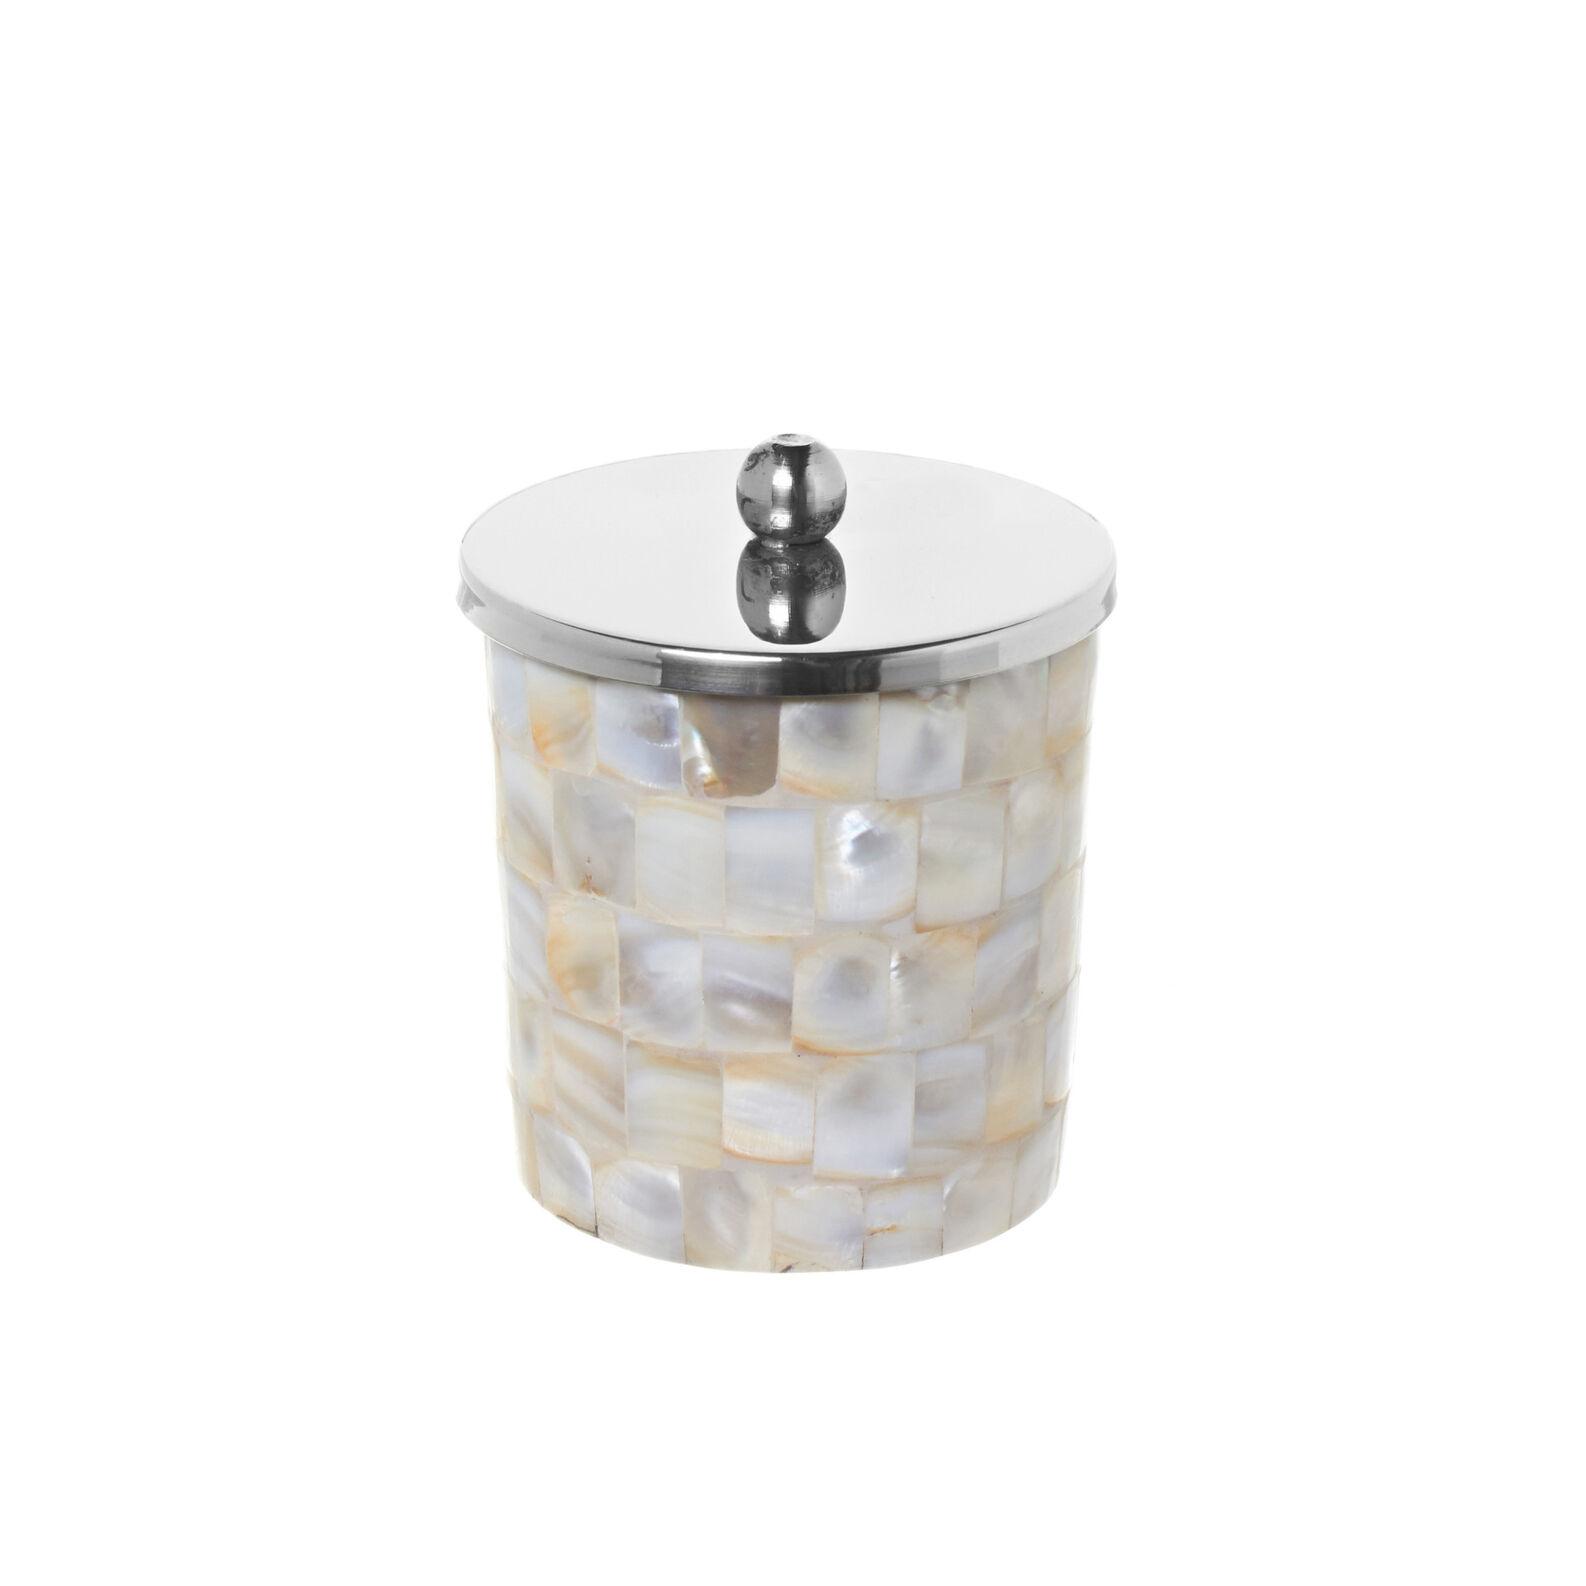 Portacotone mosaico in madreperla - coincasa